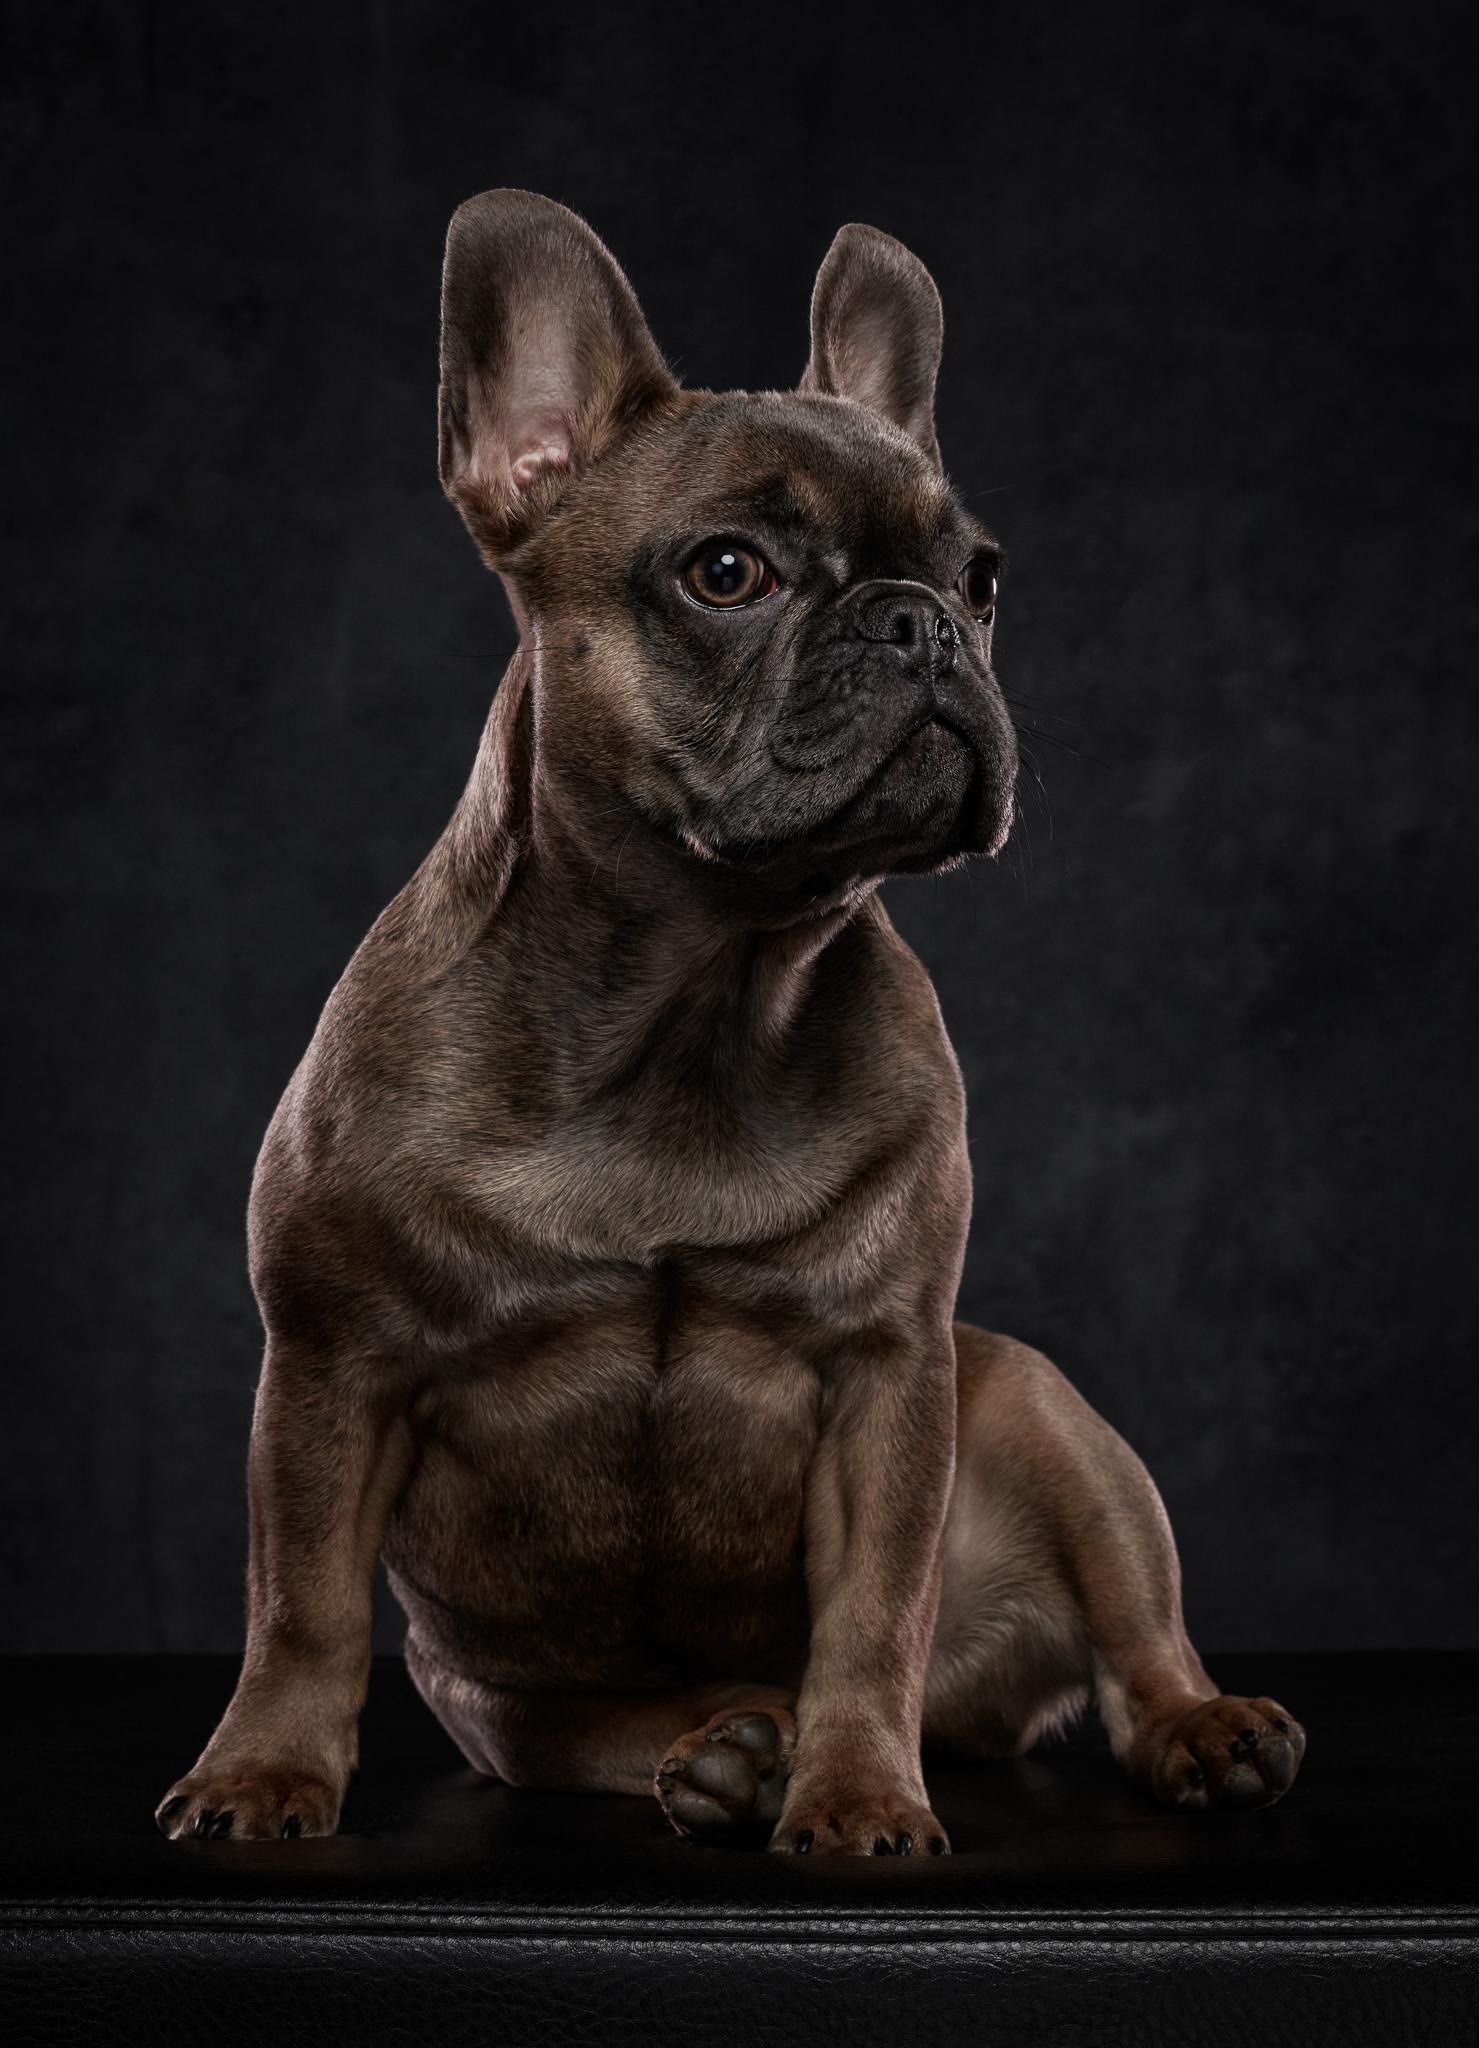 dog-photography-klaus-dyba-2.jpg